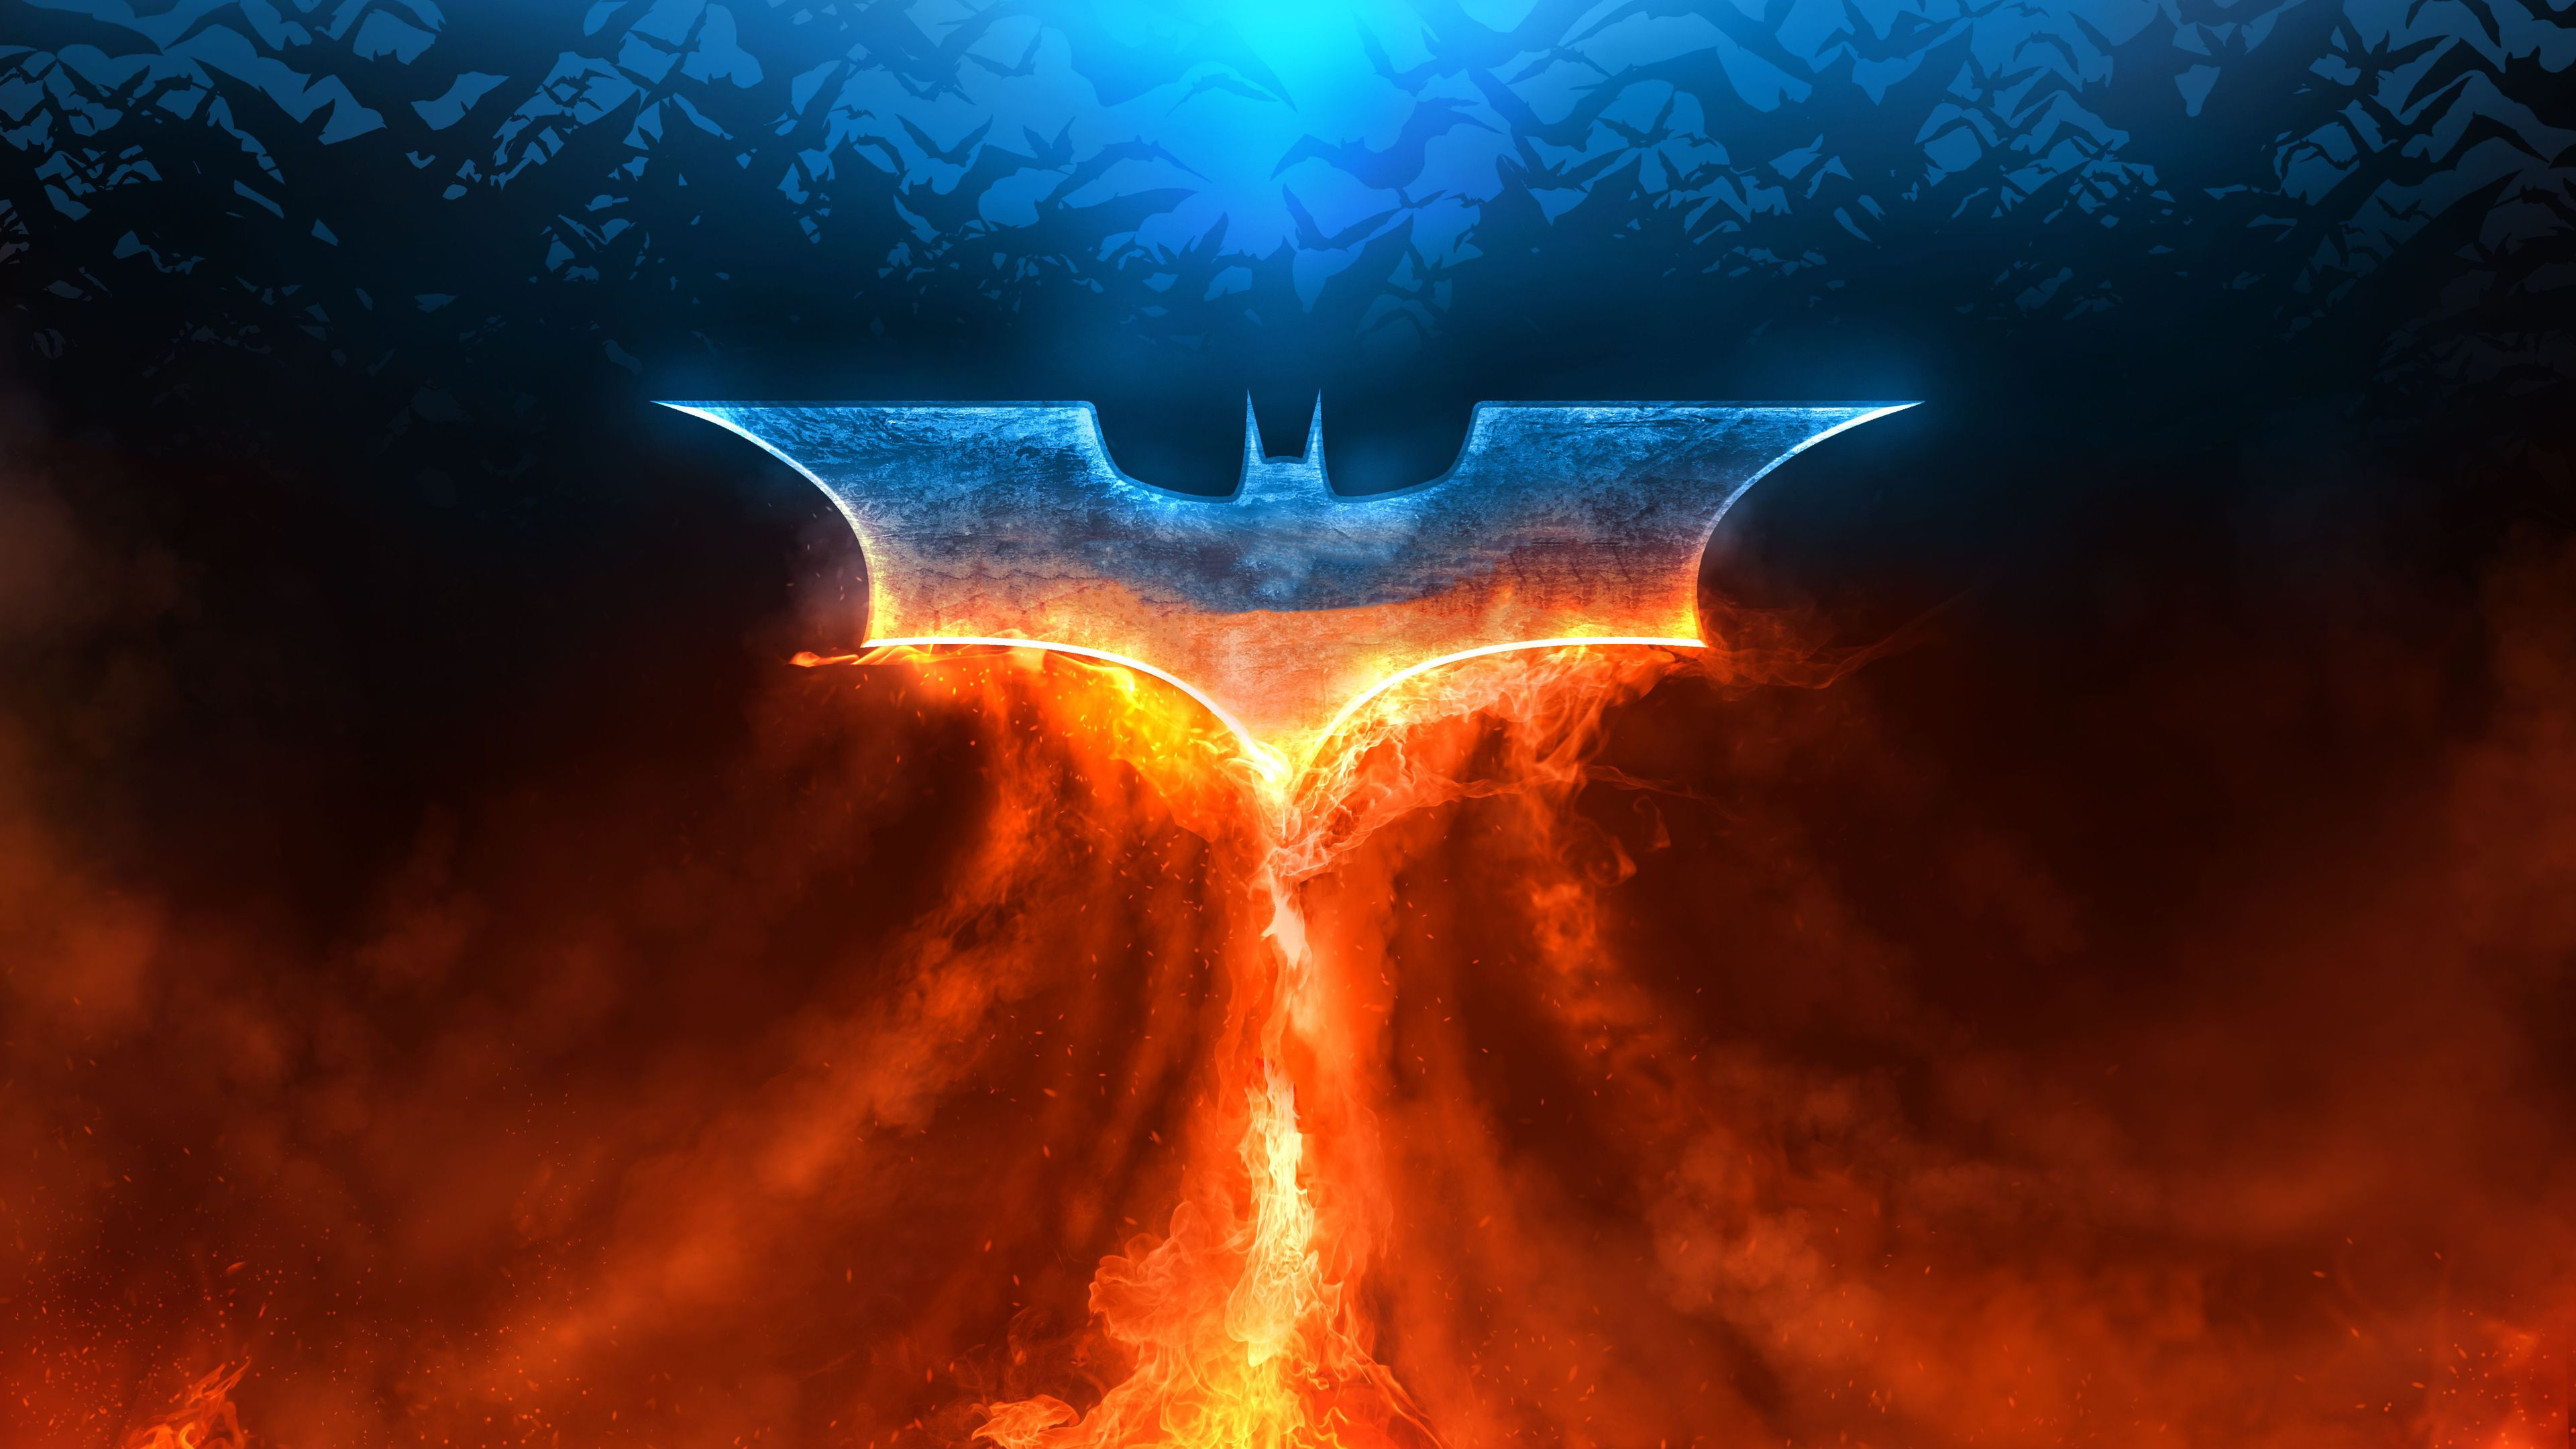 Batman Fire Rise Logo 4k Superheroes Wallpapers Logo Wallpapers Hd Wallpapers Batman Wallpapers 5k Wal Batman Wallpaper Logo Wallpaper Hd Creative Graphics